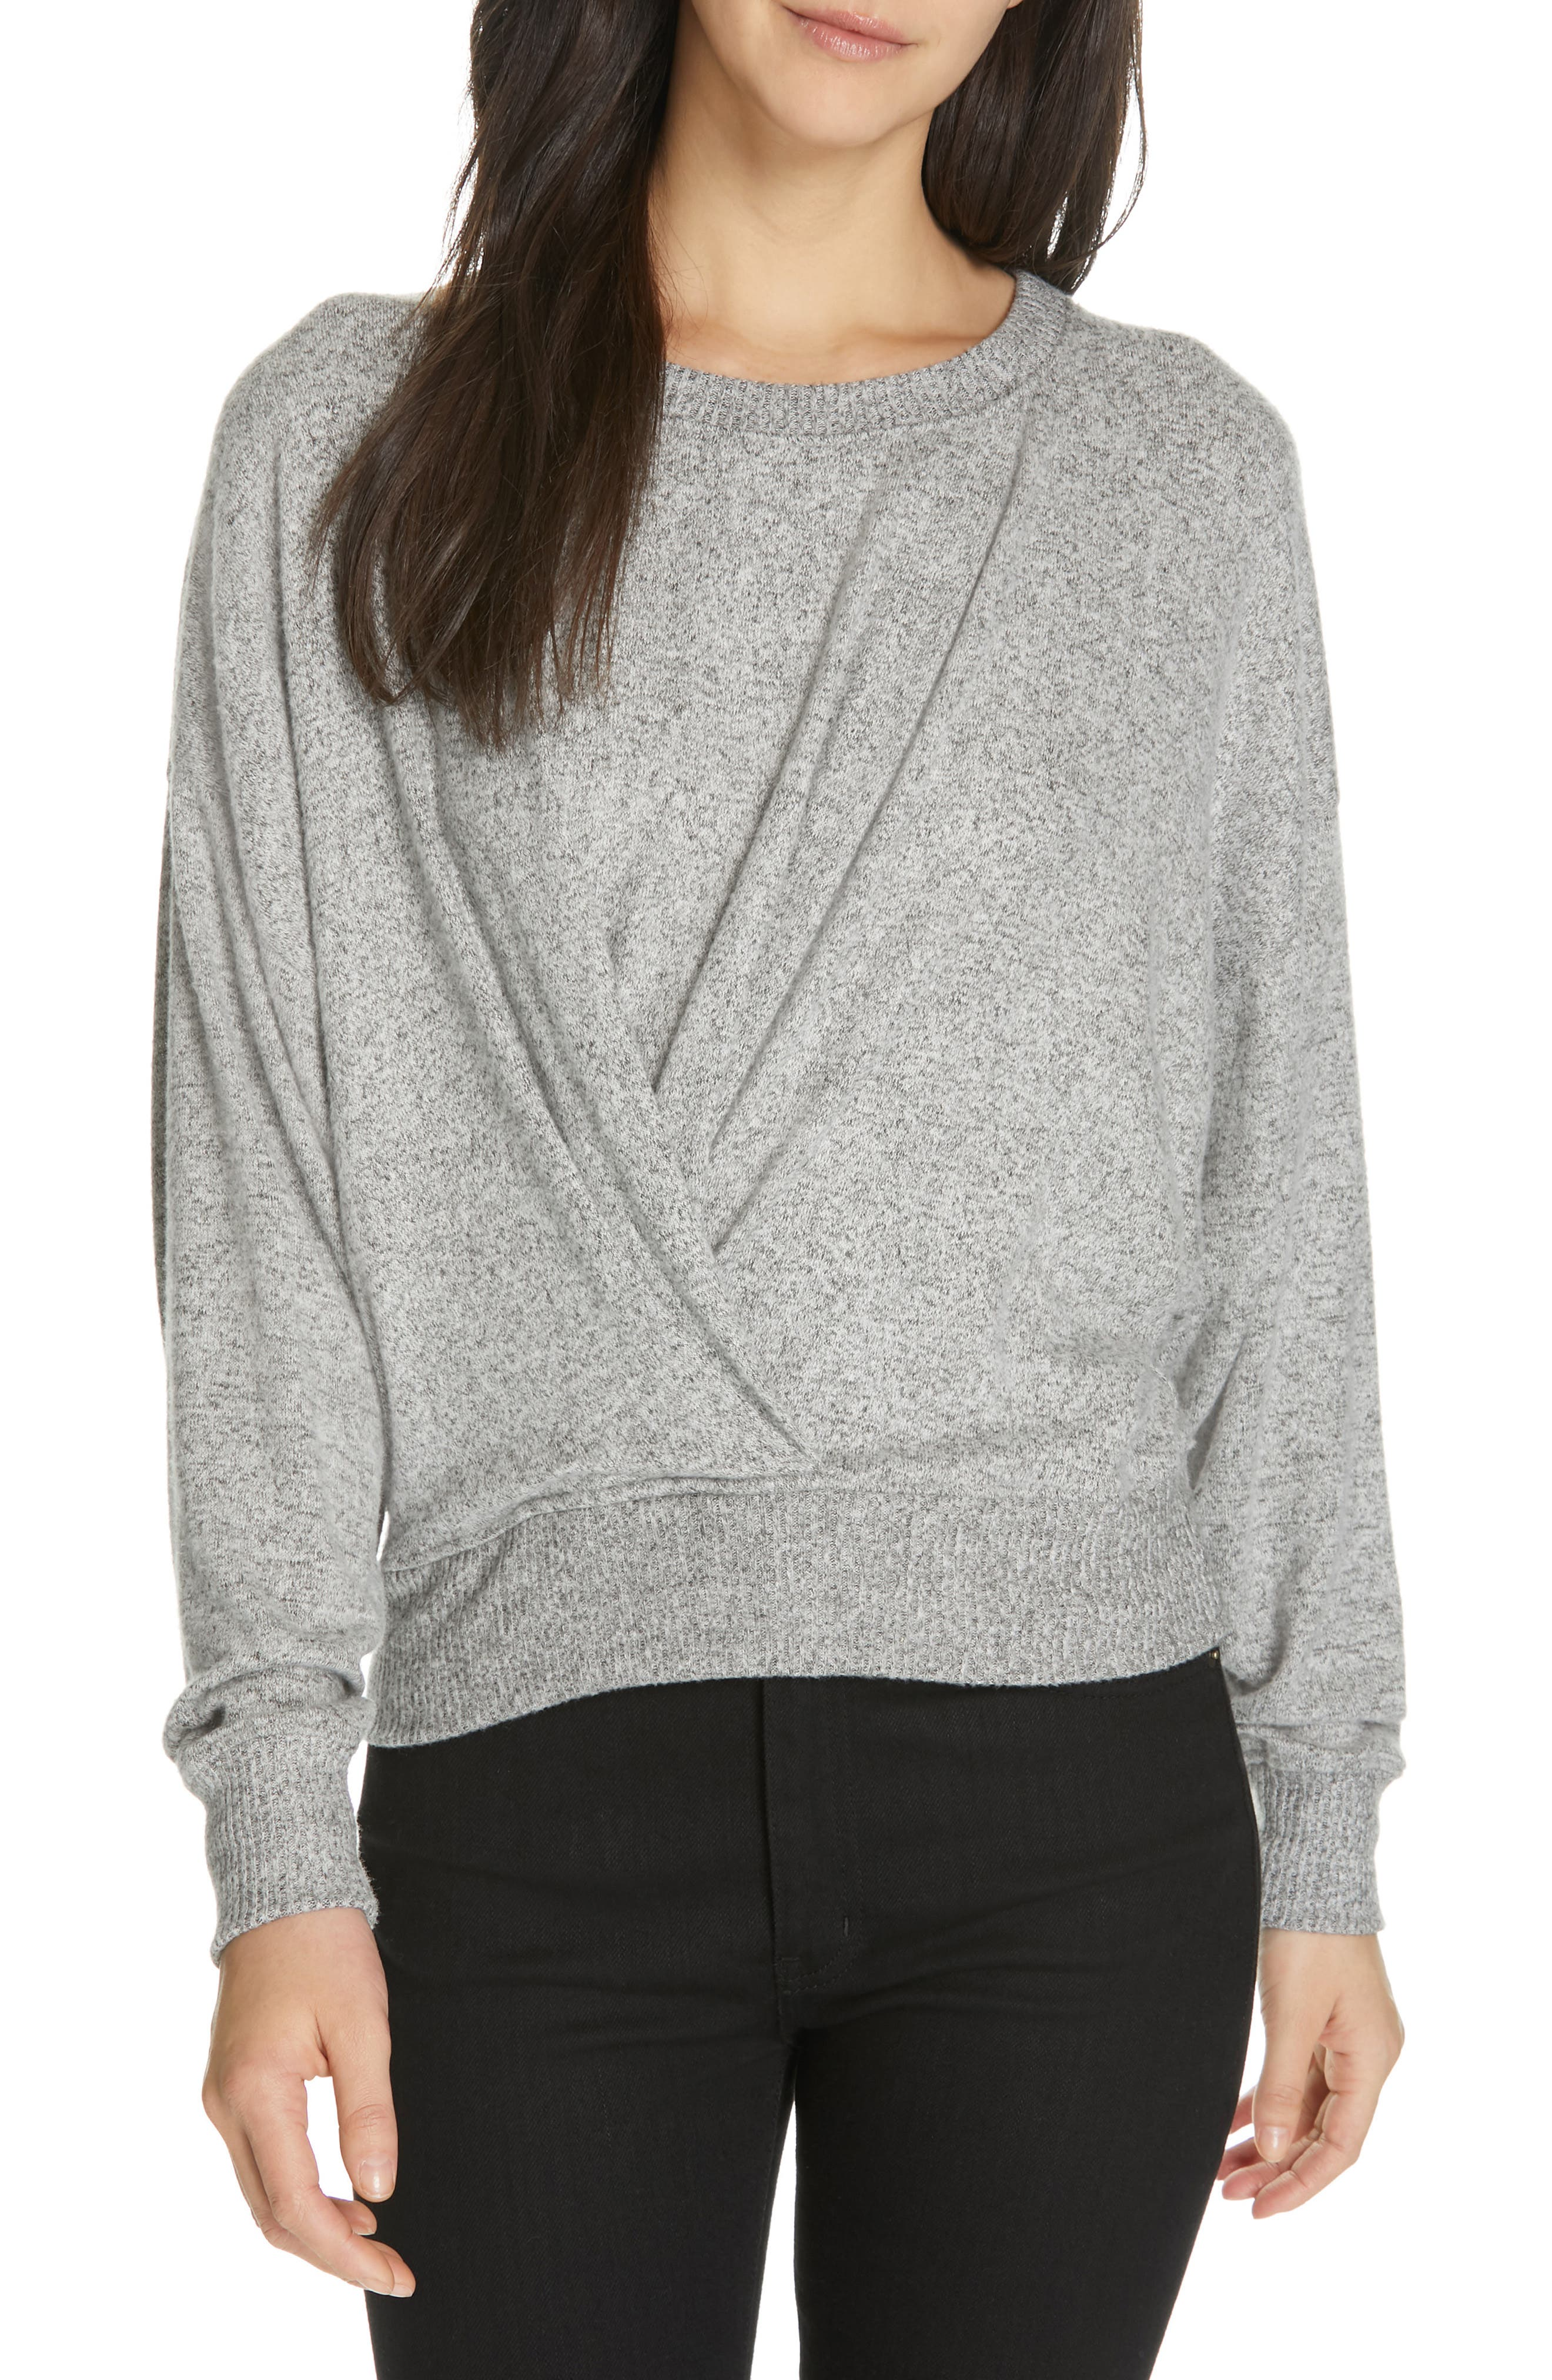 JOIE Yerrick Sweater, Main, color, 030